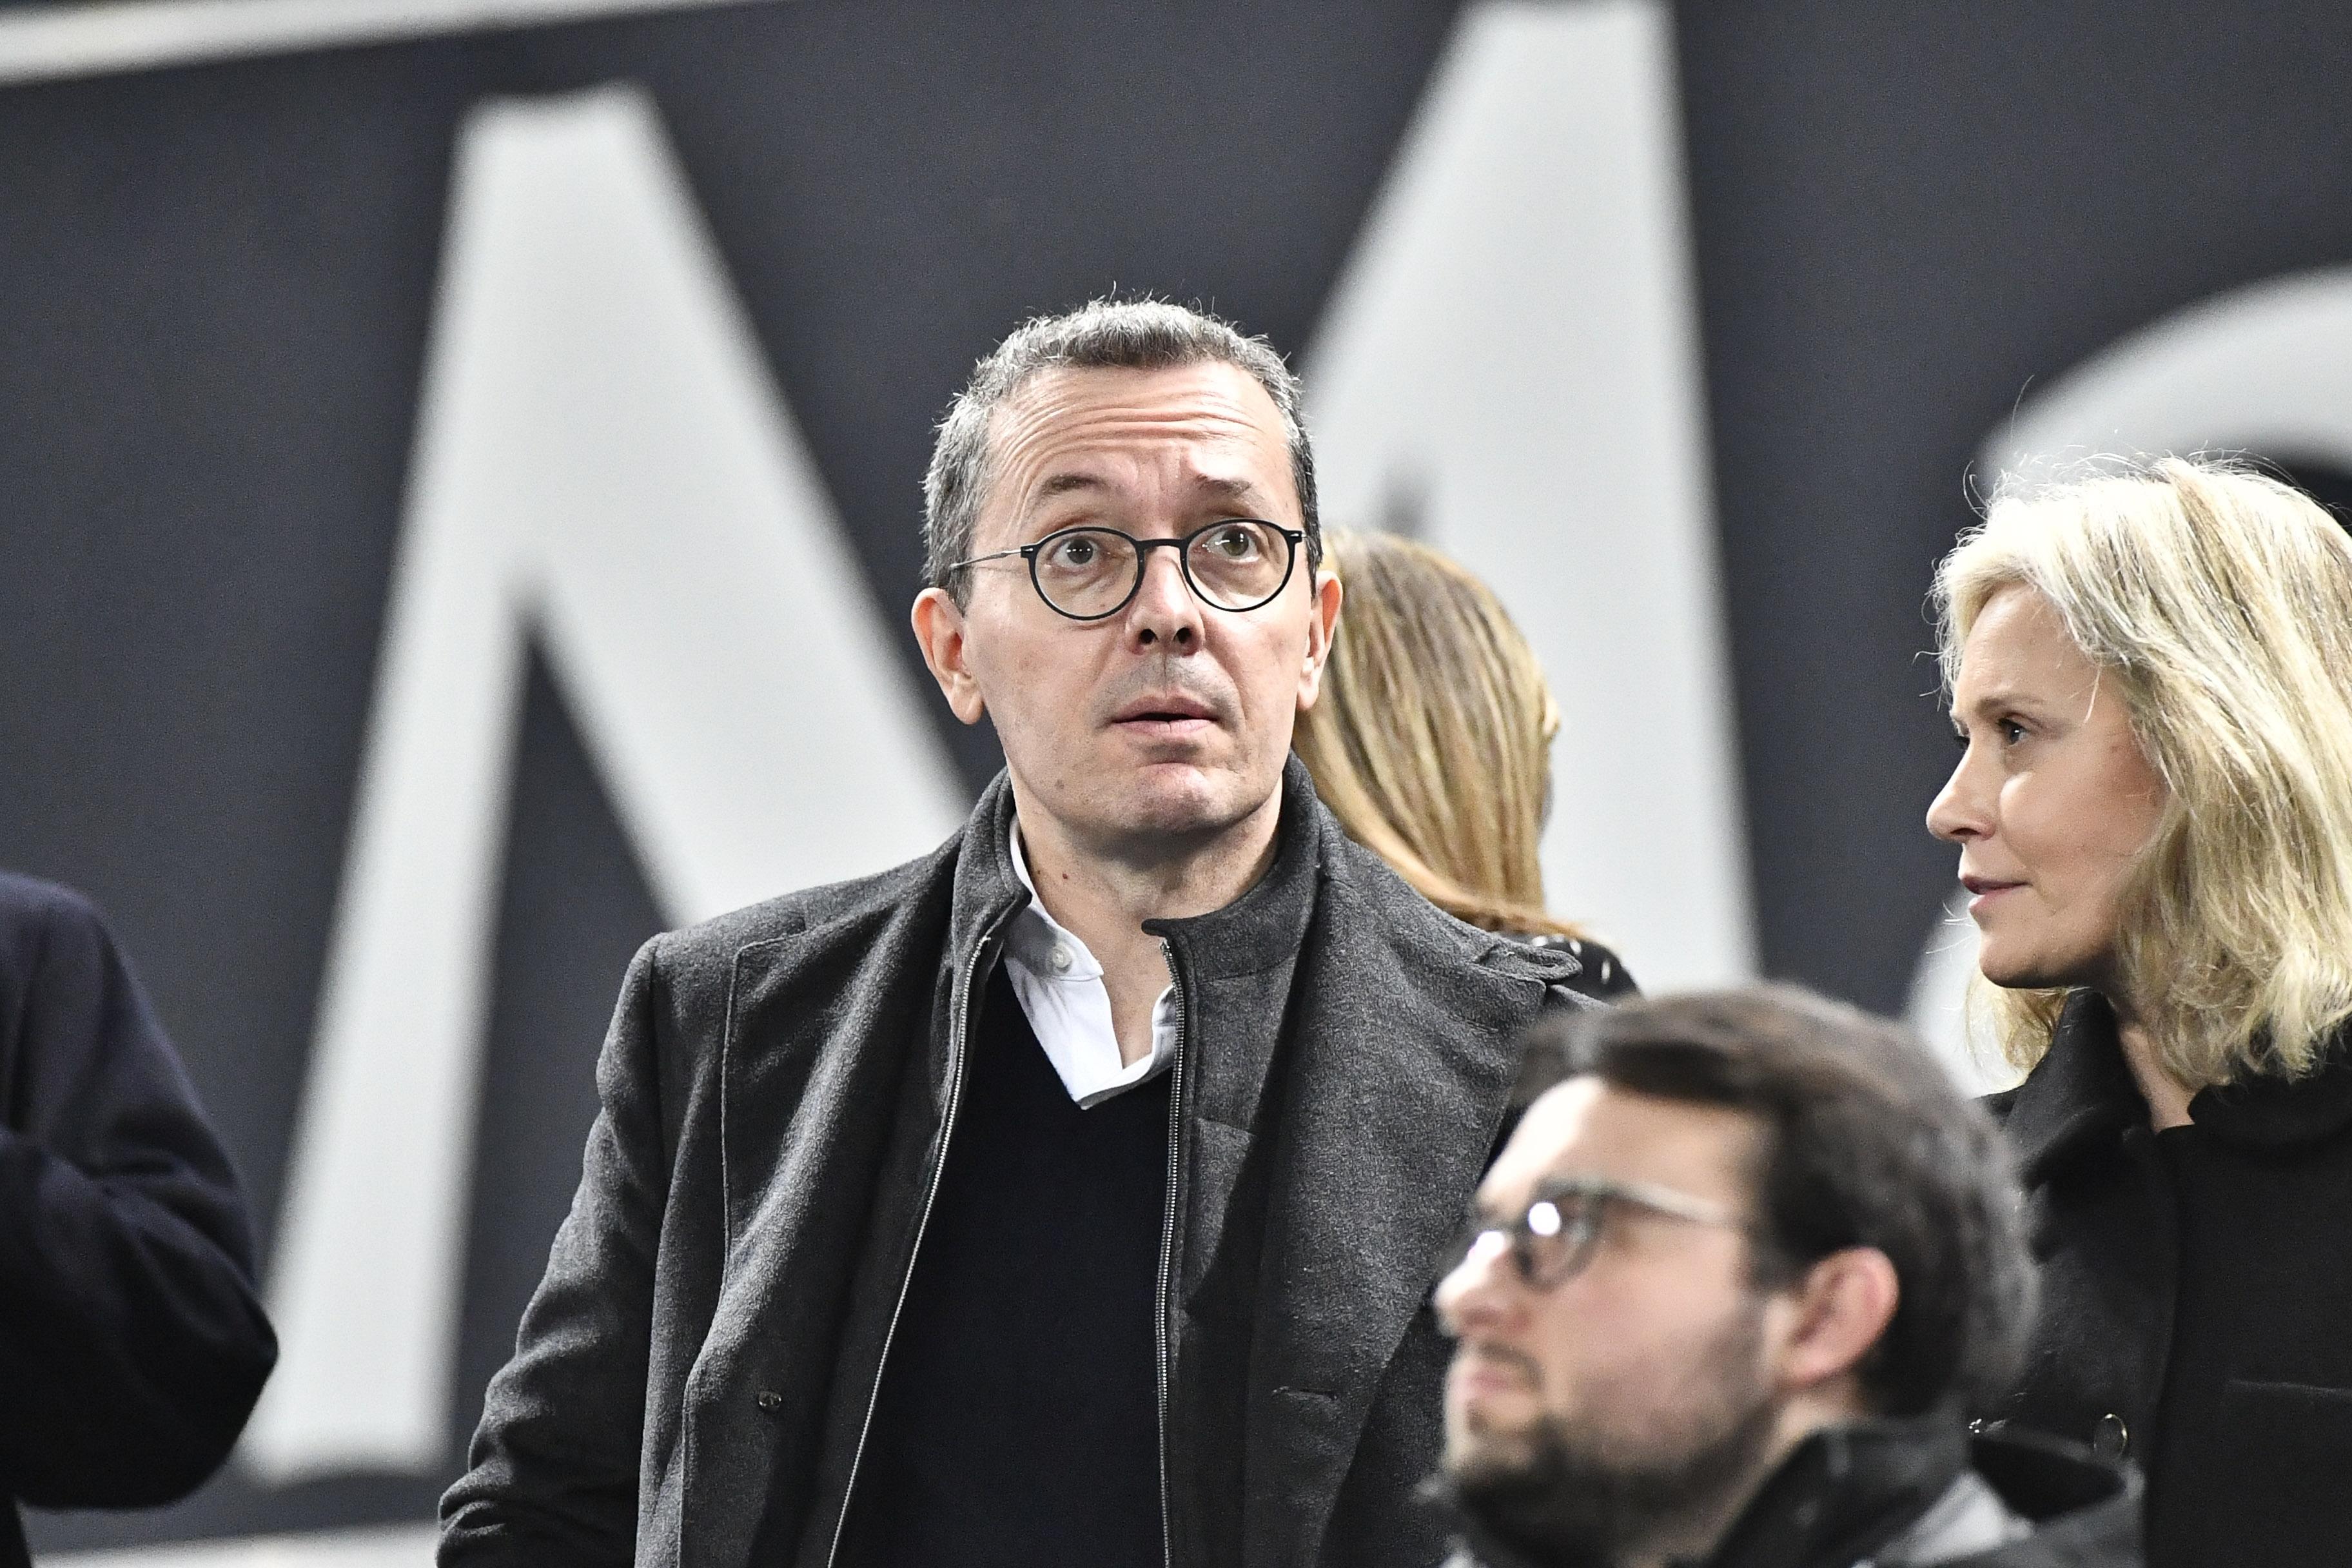 Football - Ligue 1 - Rachat de l'OM par Ajroudi-Boudjellal: Eyraud balaie (encore) les «rumeurs»